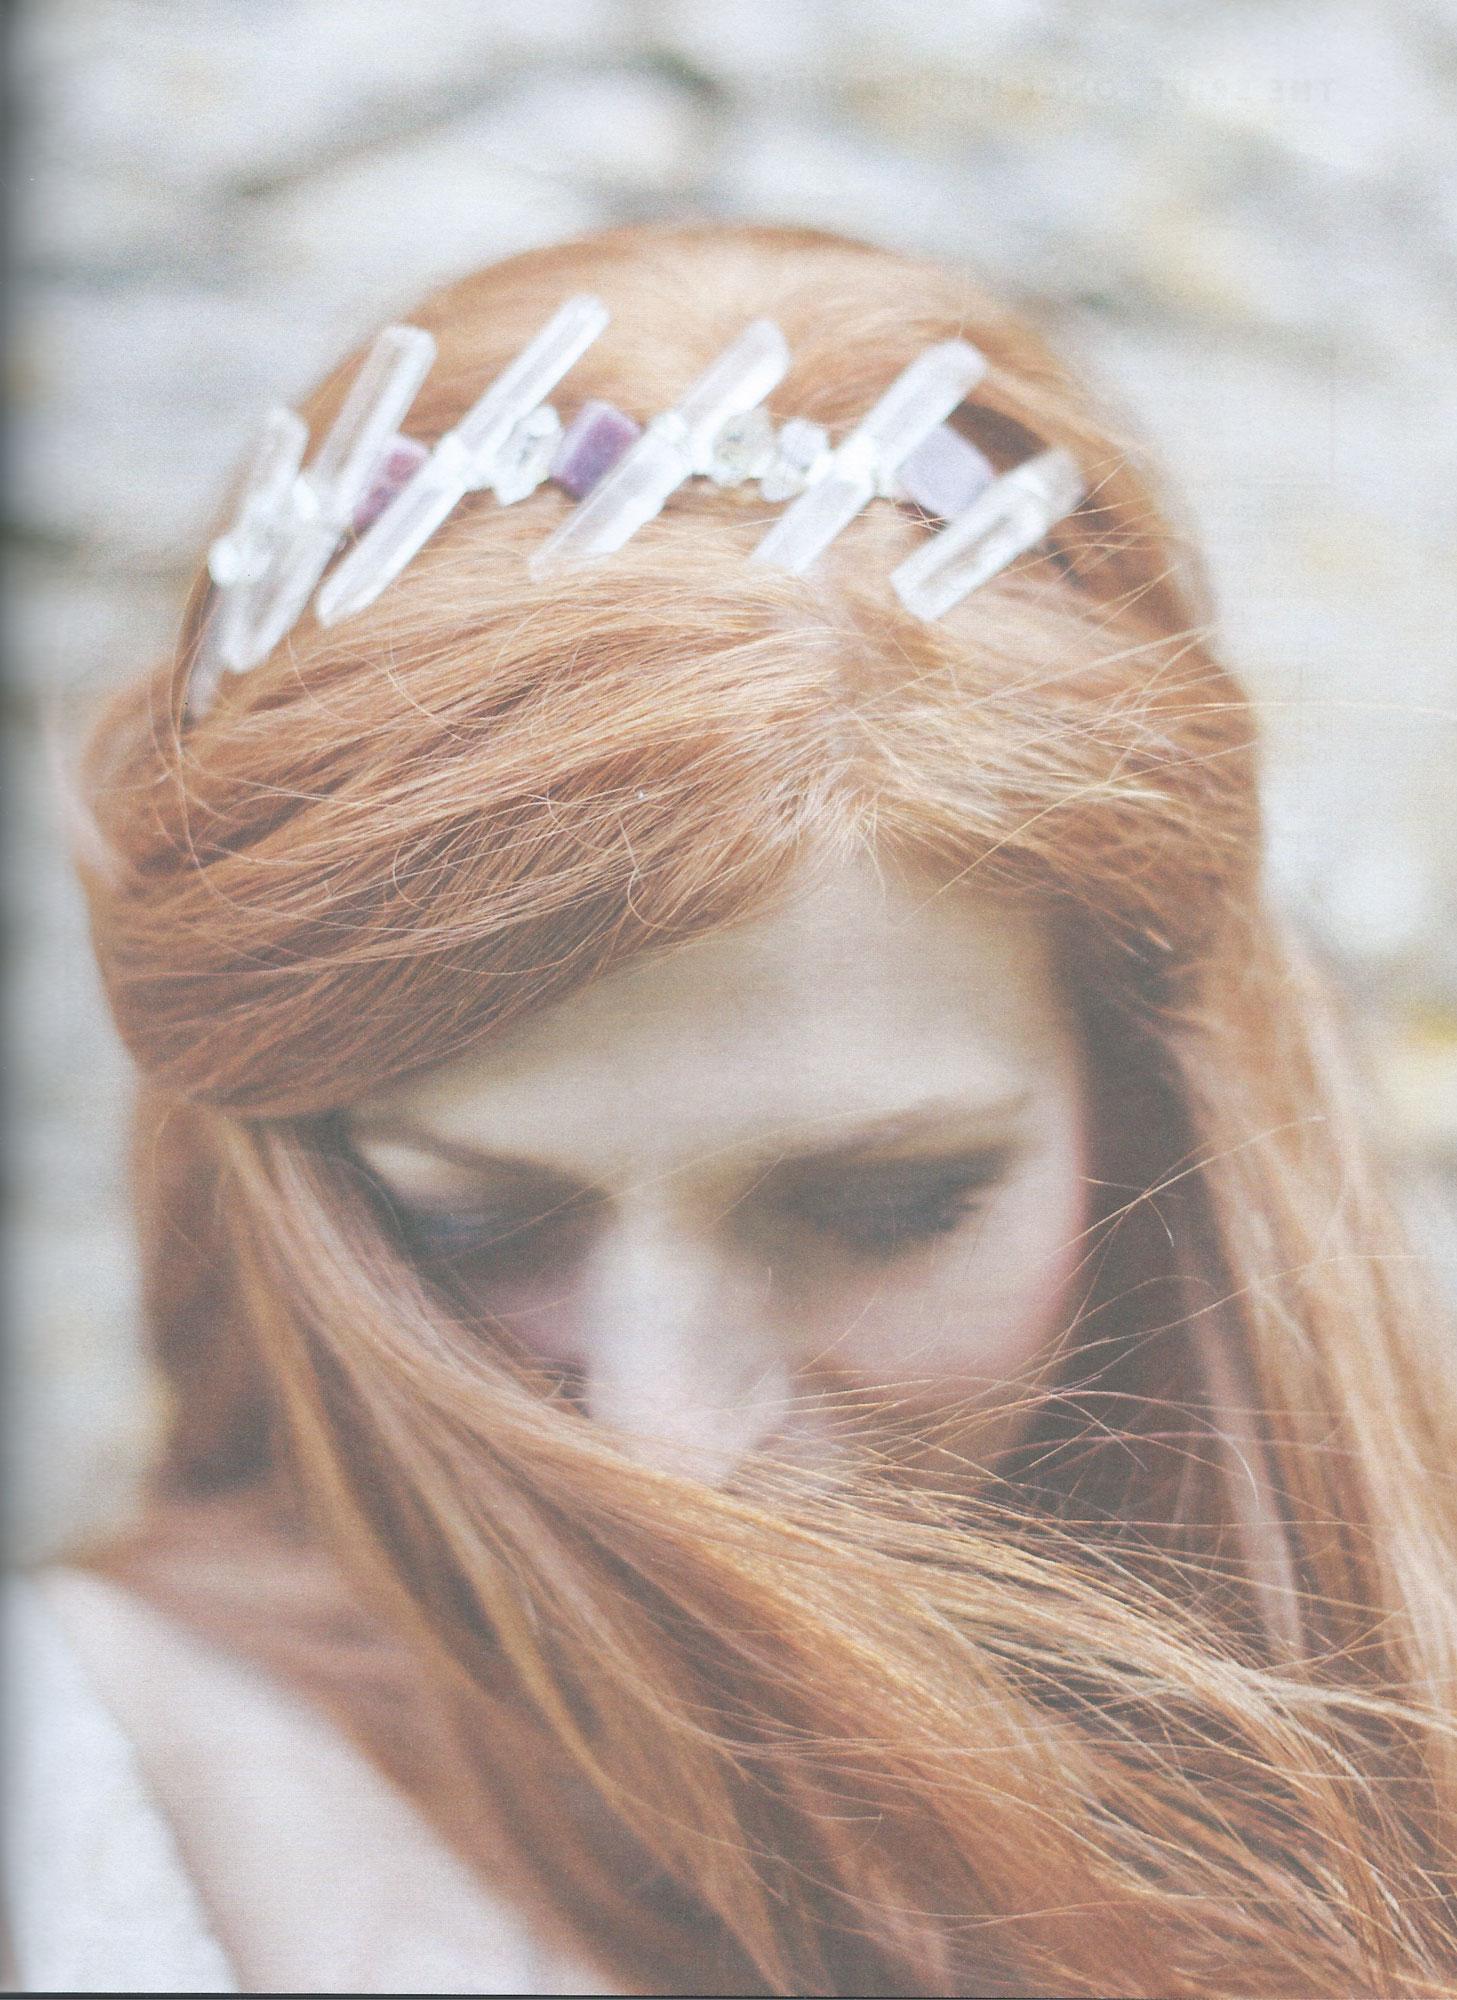 Gems_geode_GameOfThrones_Wedding_LauraPower.jpg.jpg